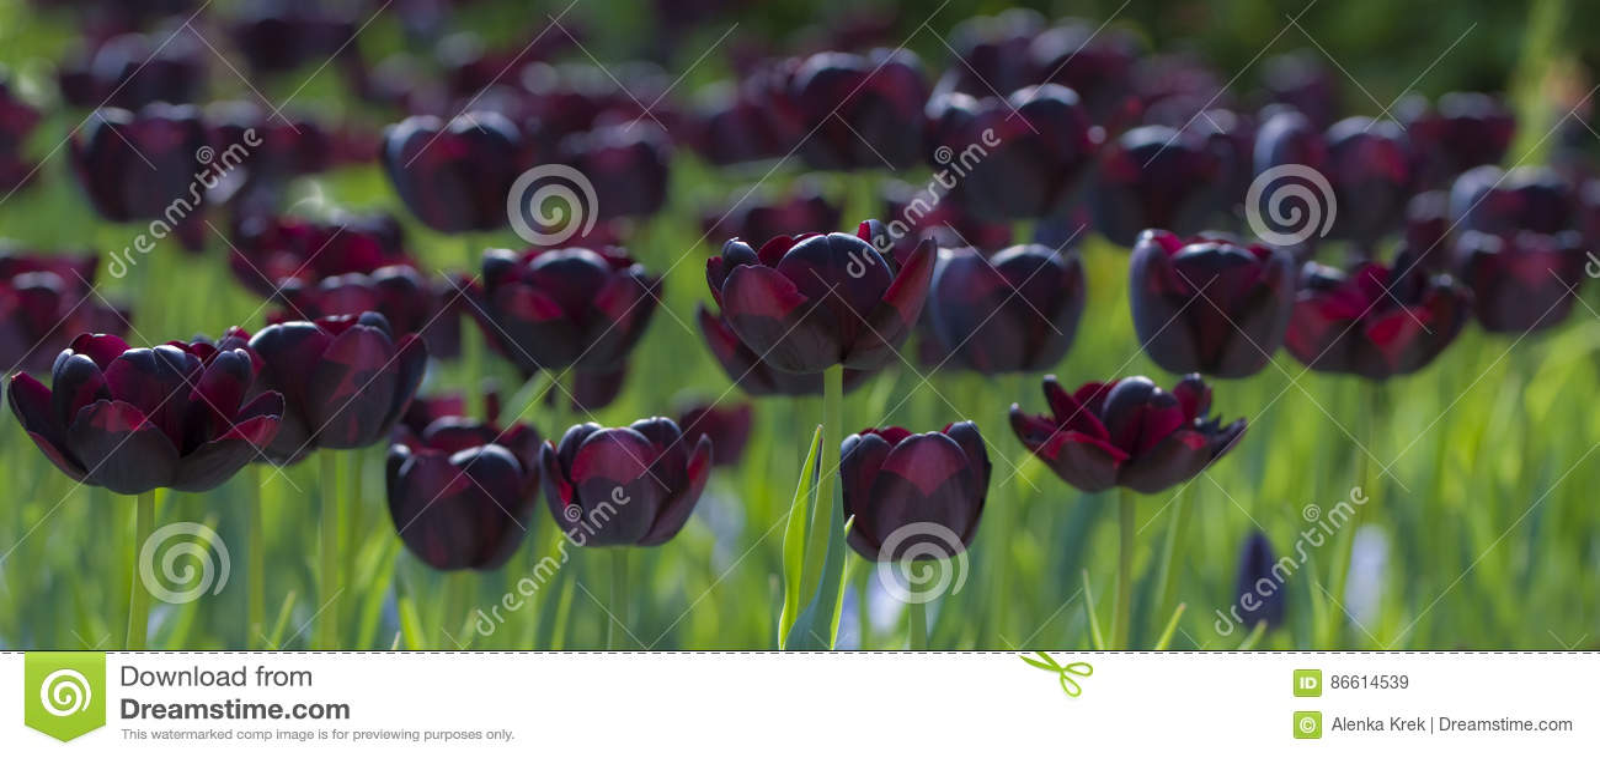 dark purple tulips or black tulips in the park stock image image